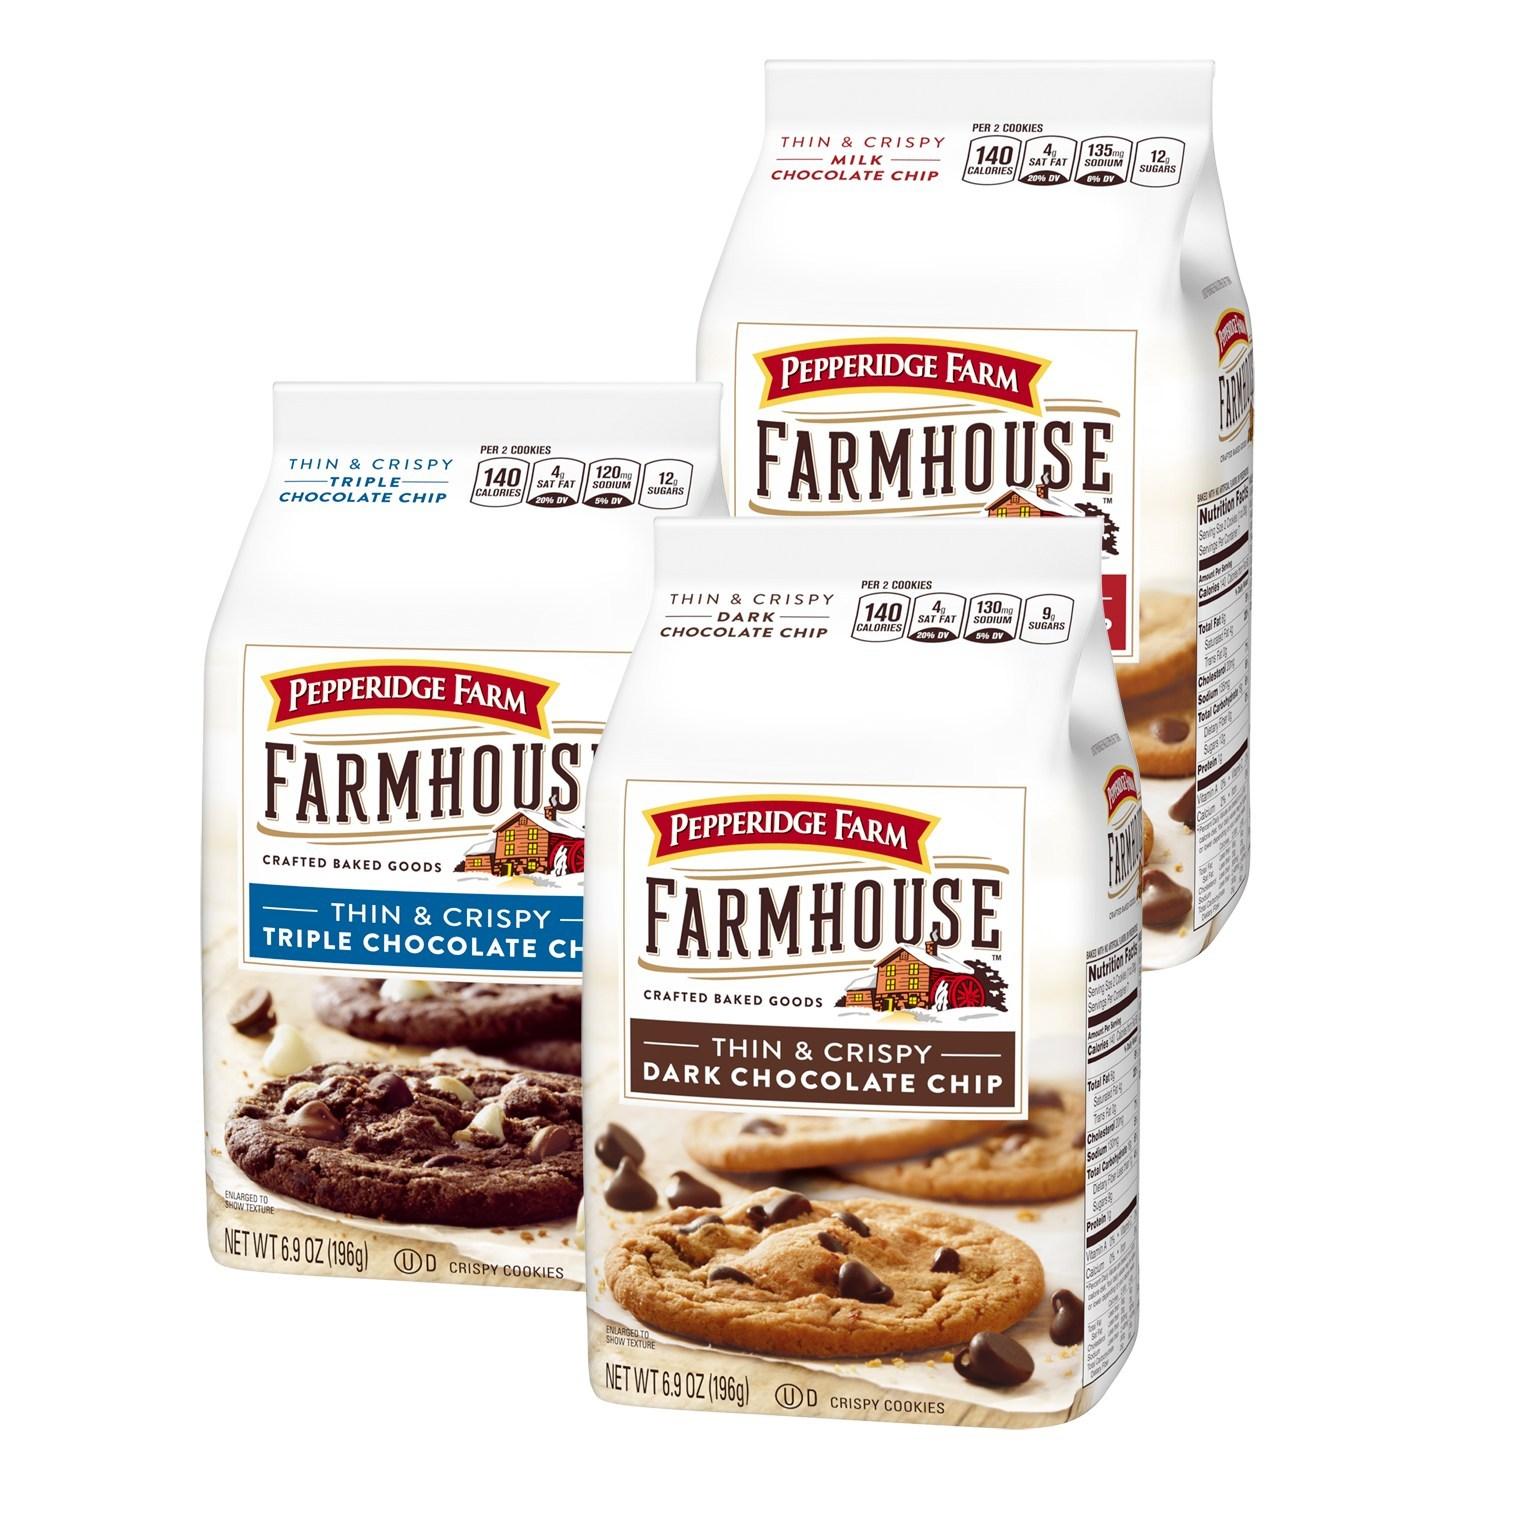 Pepperidge Farm's Farmhouse cookies line will now feature a gluten-free option.